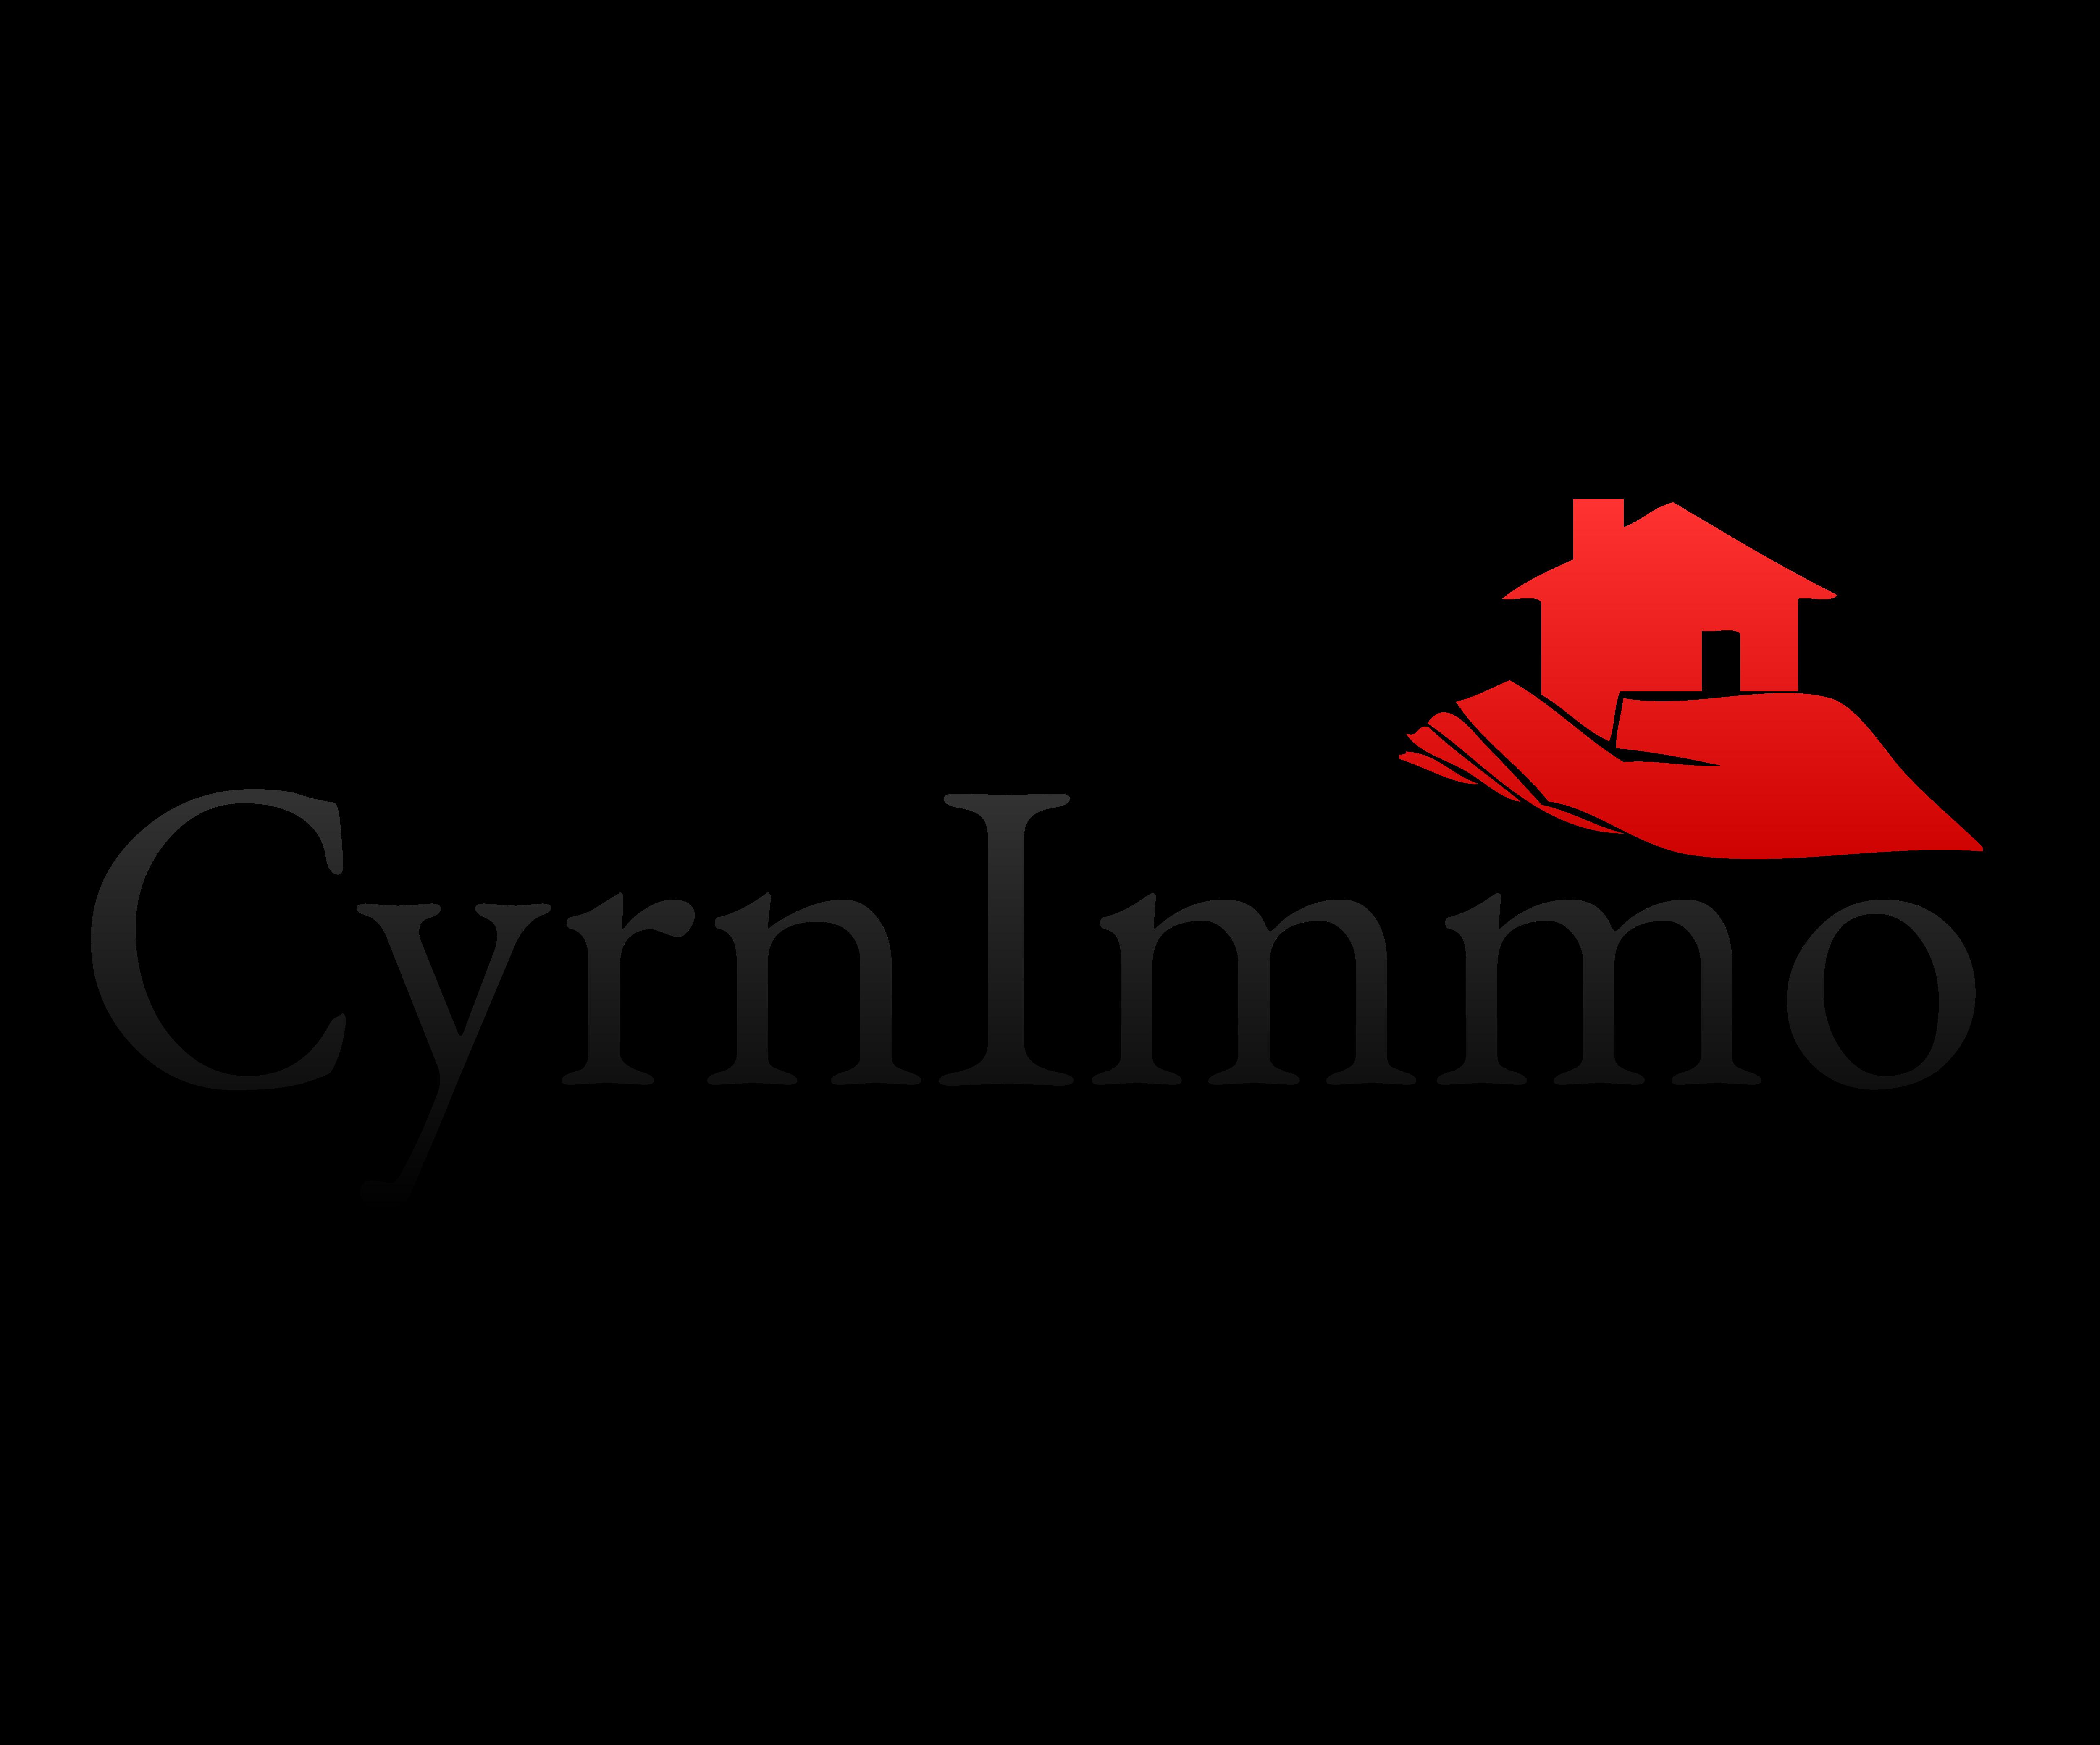 Cyrnimmo agence immobilière